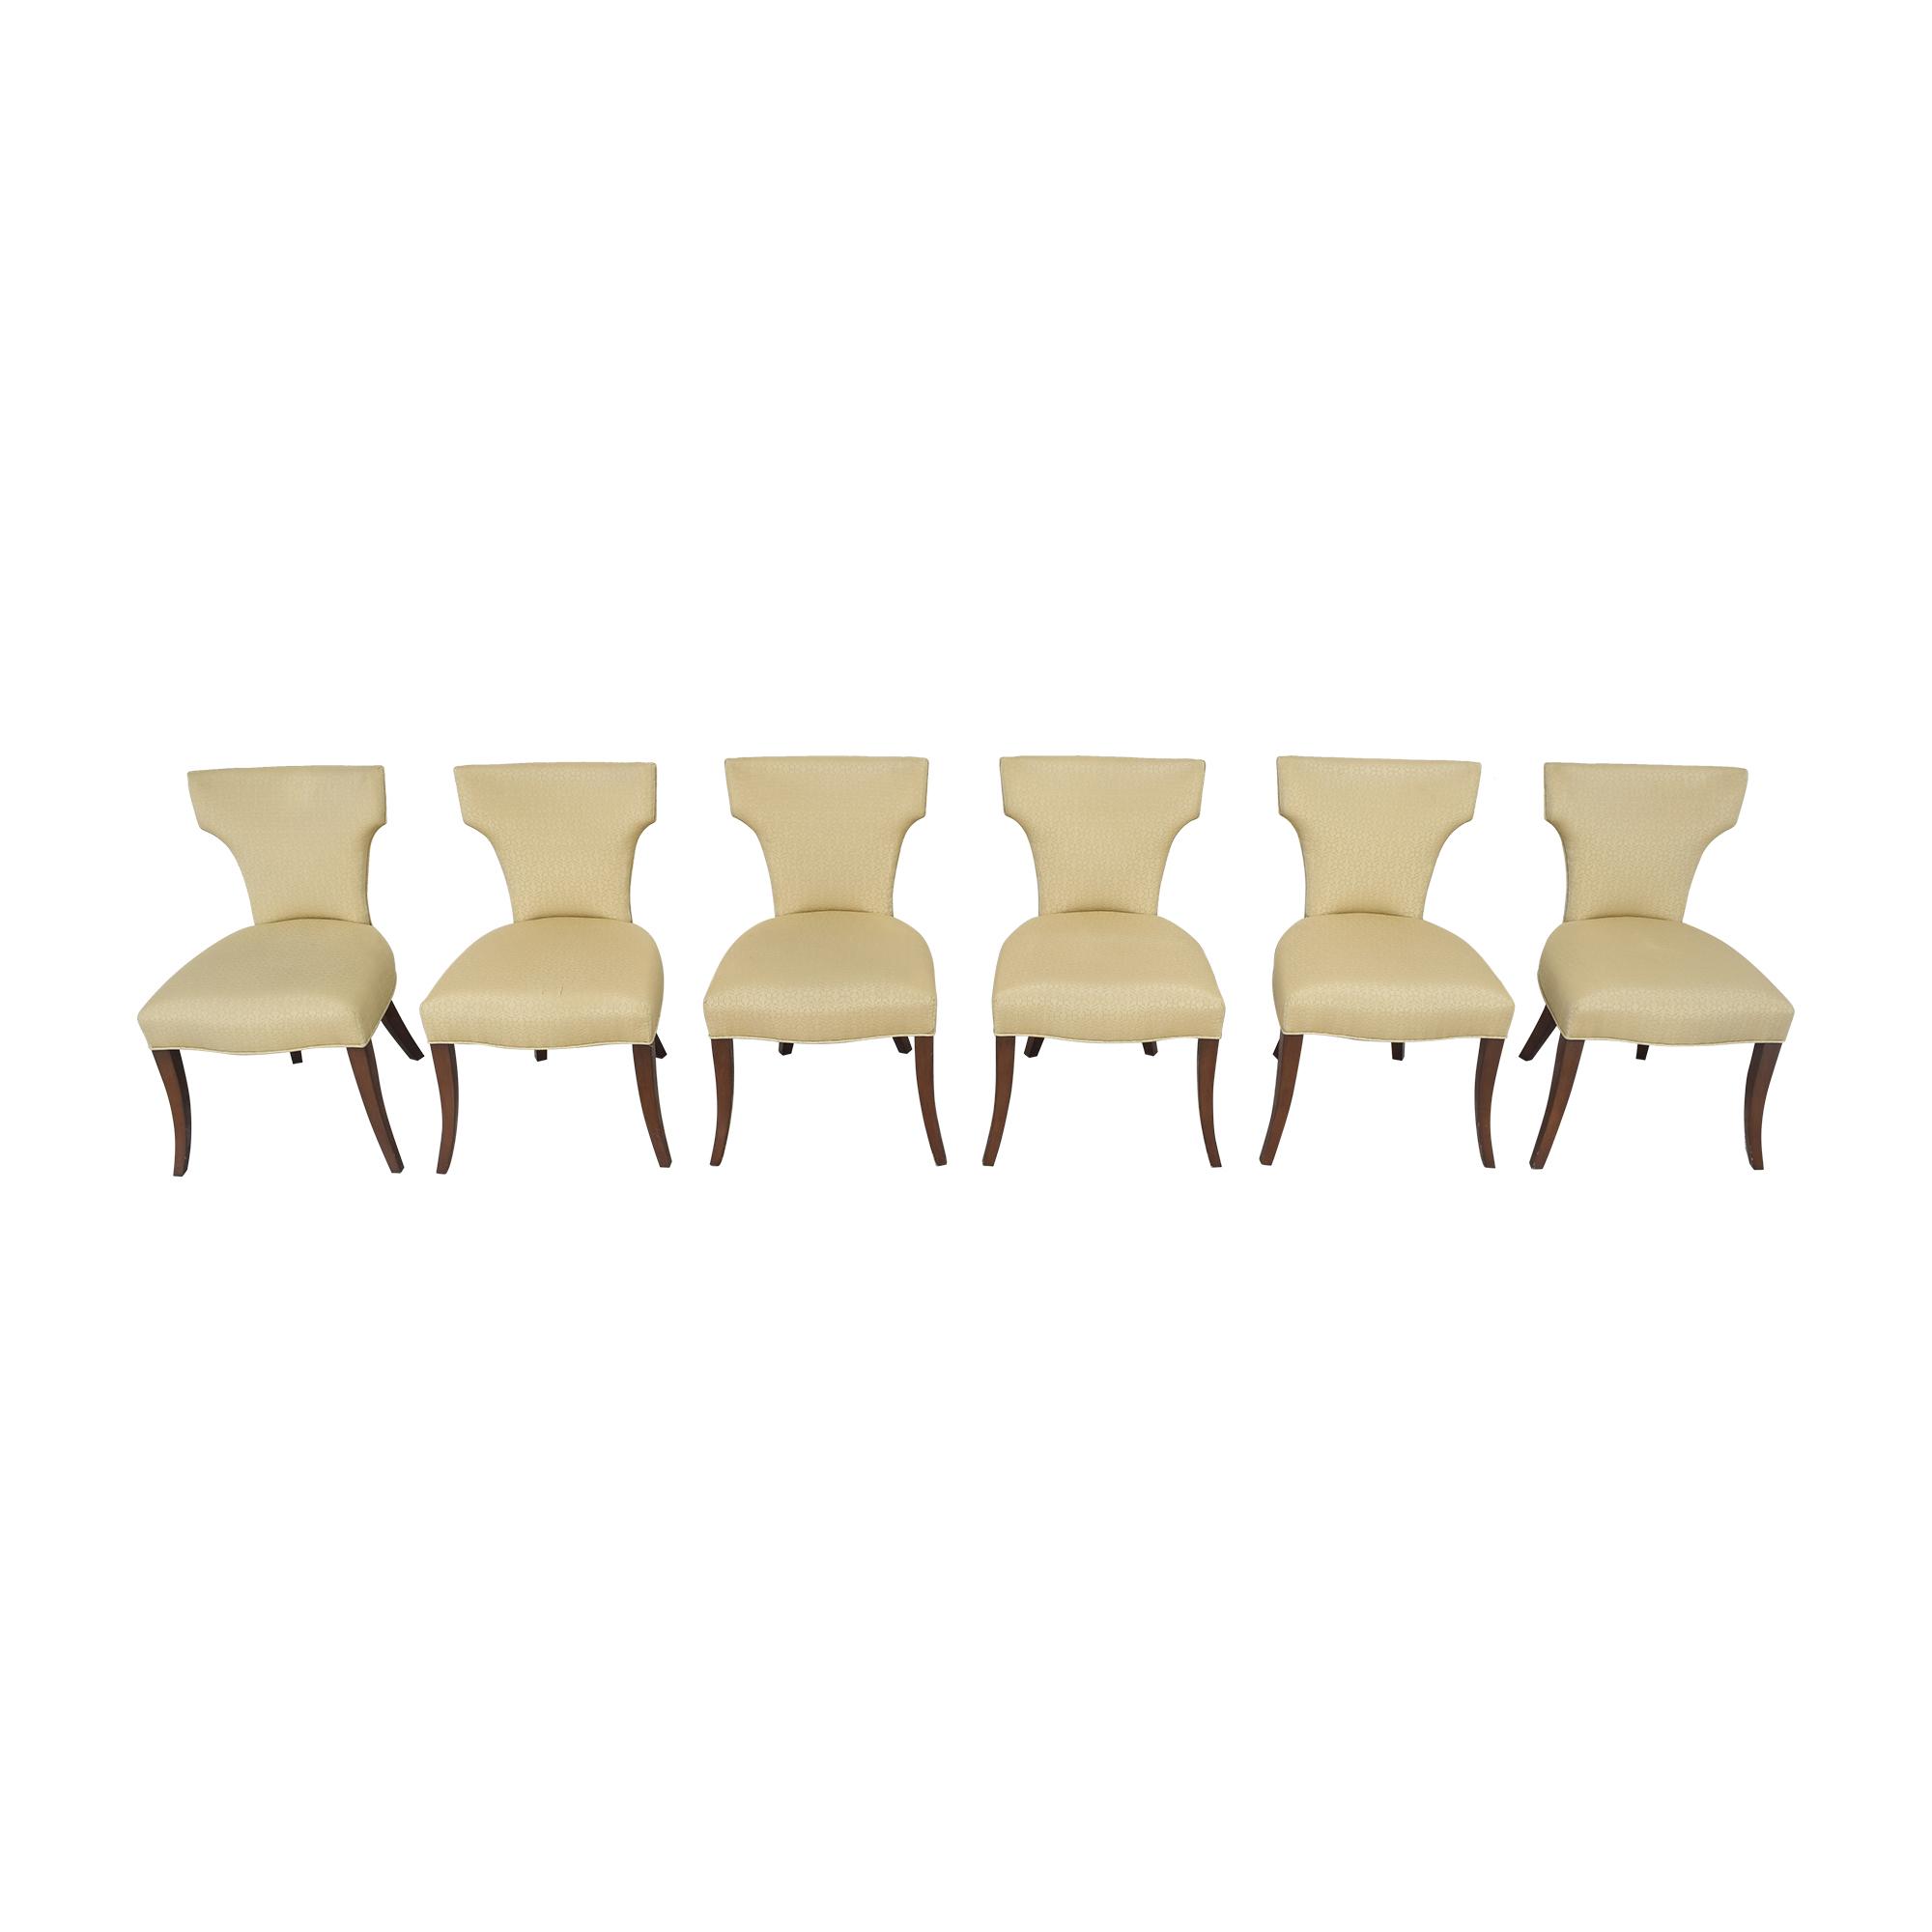 Ferrell Mittman Ferrell Mittman Custom Wing Dining Chairs on sale